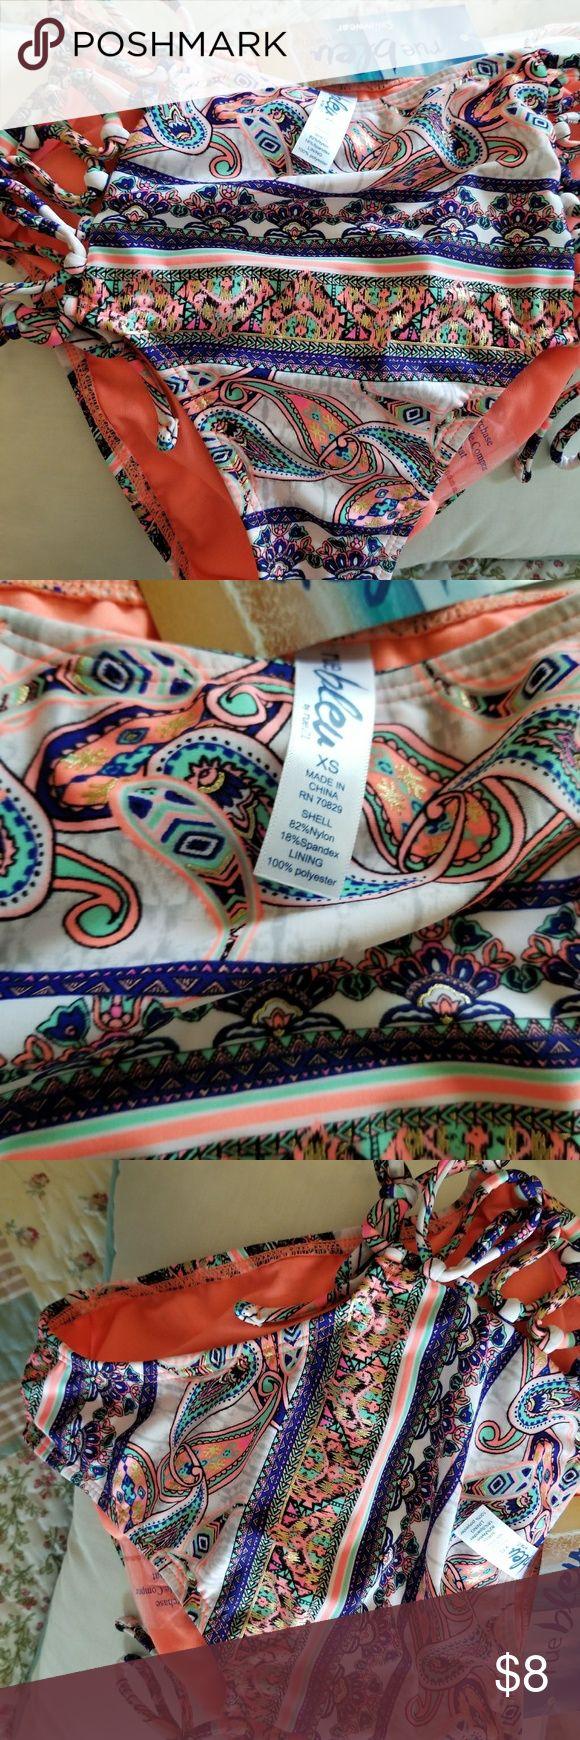 Coral & Cobalt High Waist Bikini Swimsuit Bottom Bleu absulutlely Gorgeous High Waist Bikini Bottom Swimsuit Bottom with side lacing detail in coral, royal blue, white and metallic gold accents. Resort season is near...kill it in this swim bottom. bleu by Rue 21 Swim Bikinis